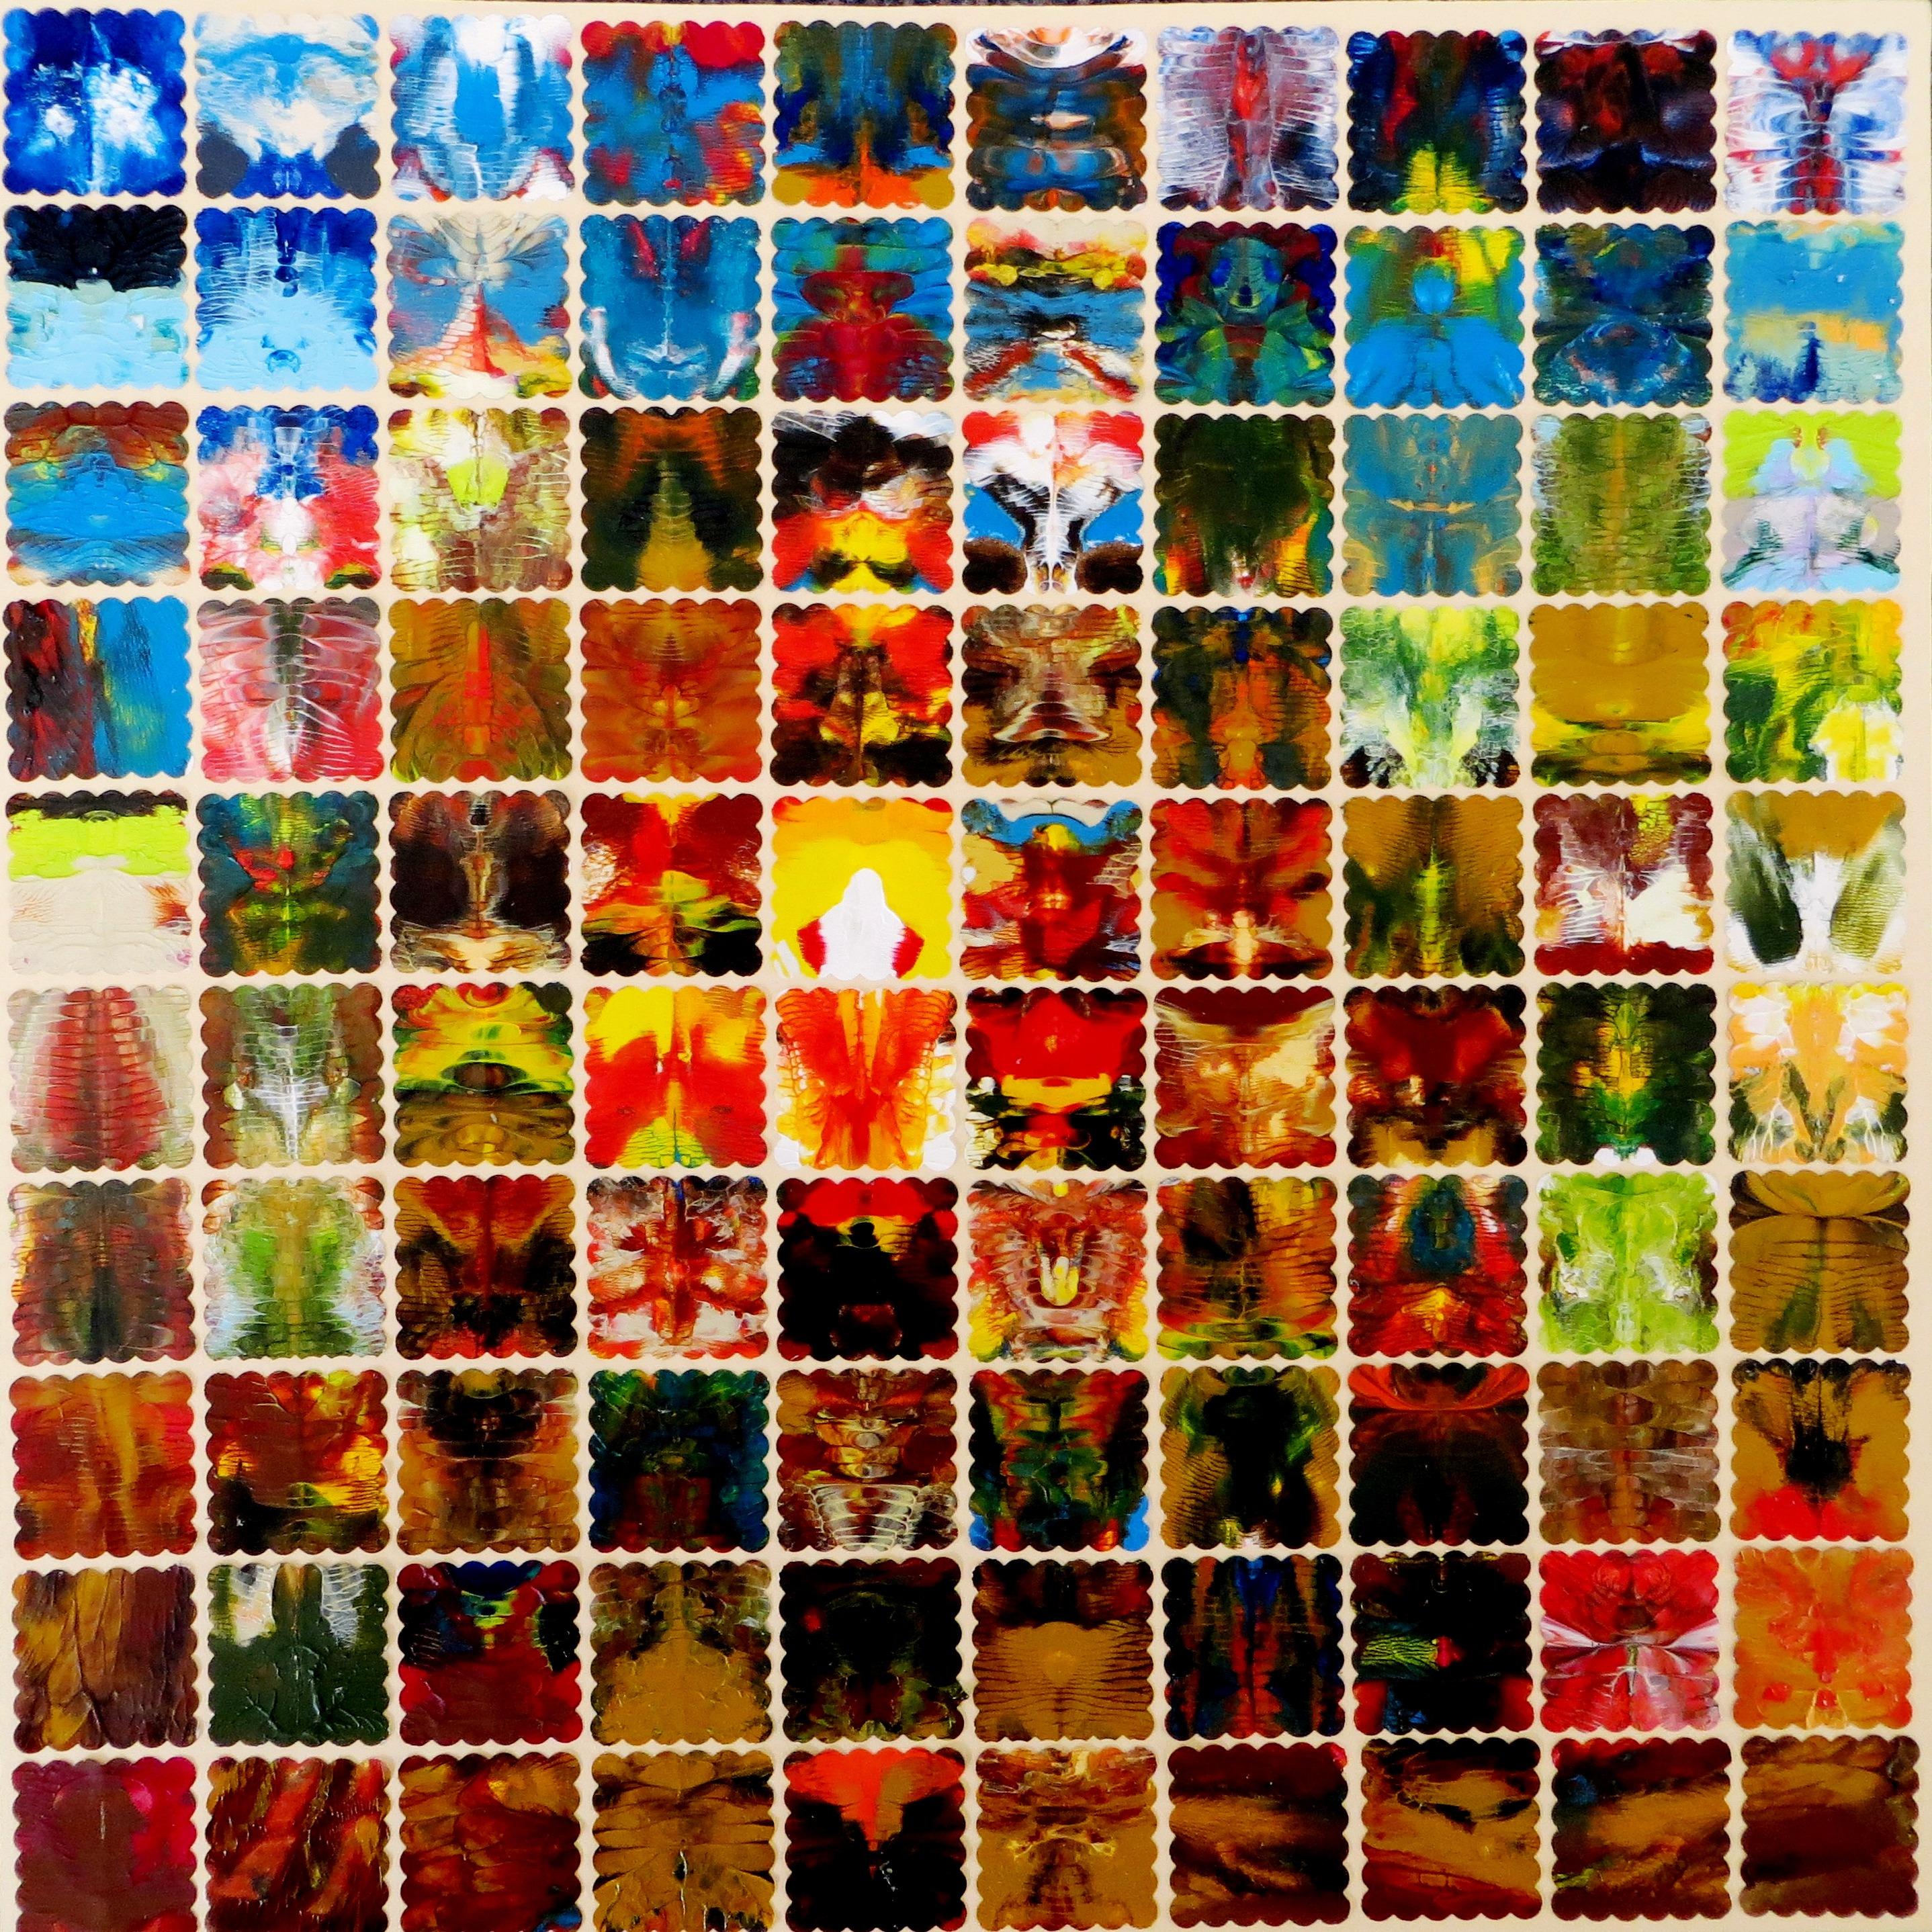 Mosaik I (30x30)  Art in Art_bearbeitet.